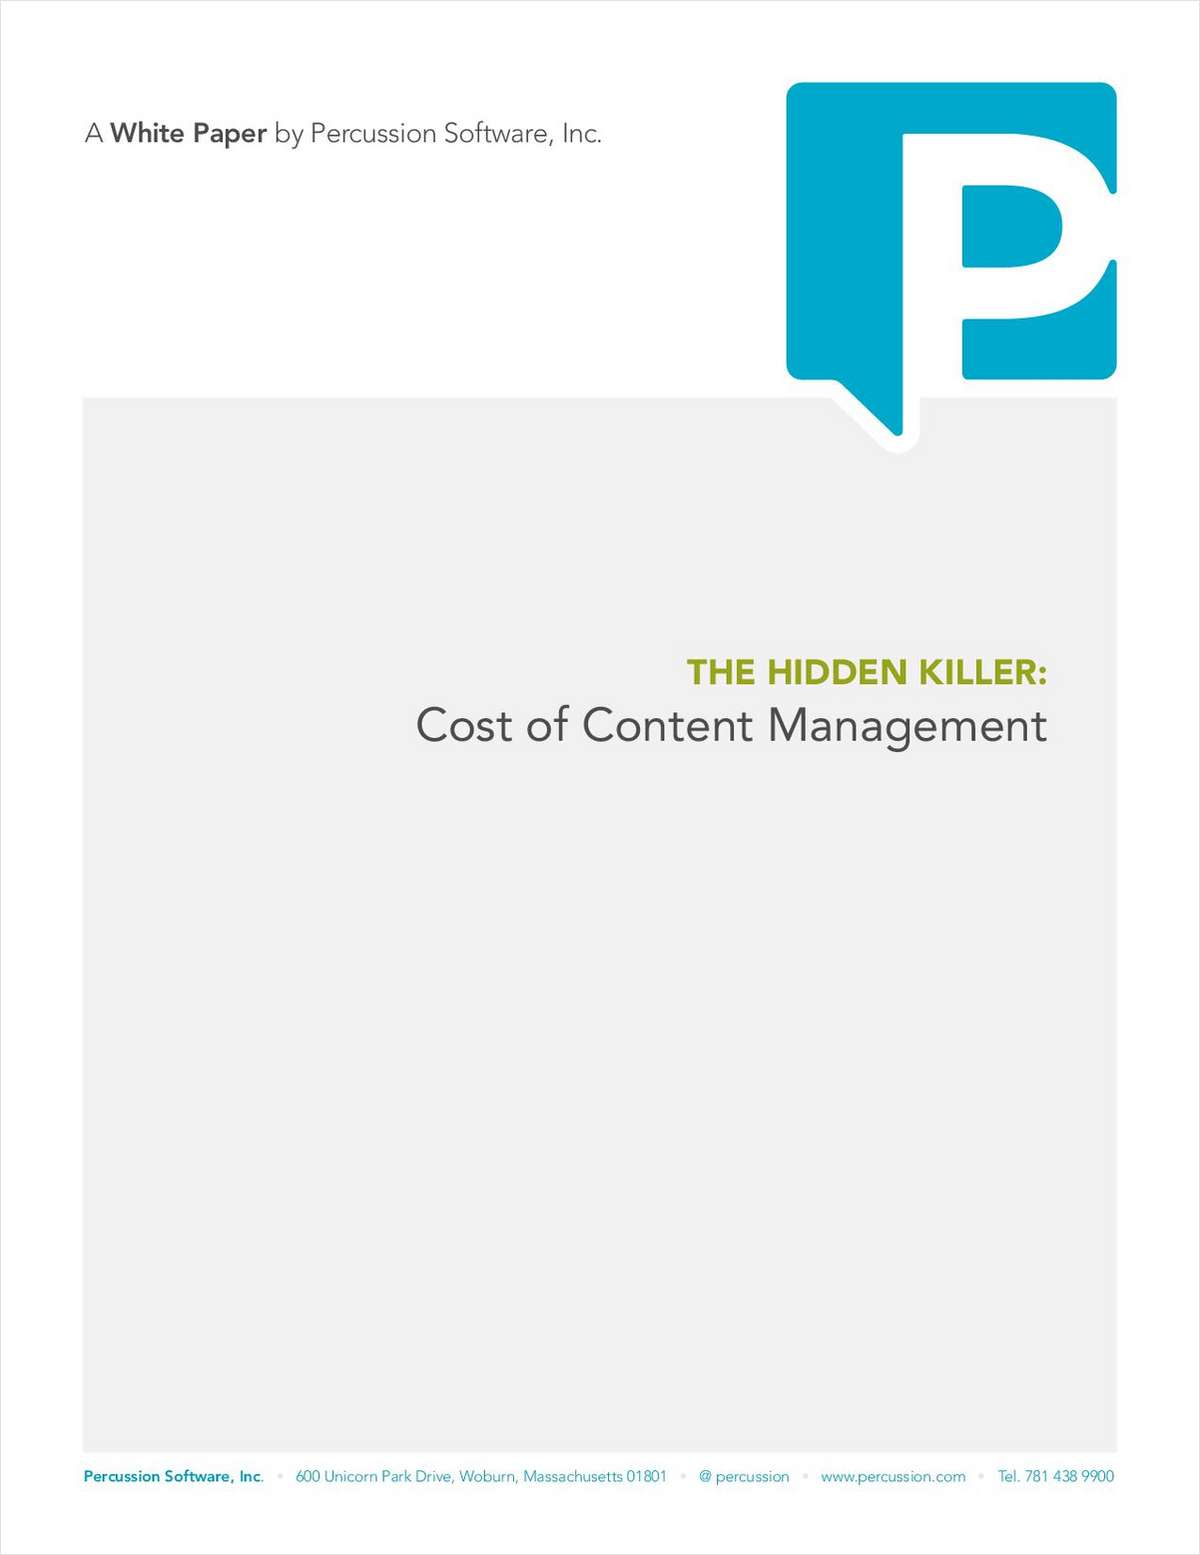 The Hidden Killer: Cost of Content Management